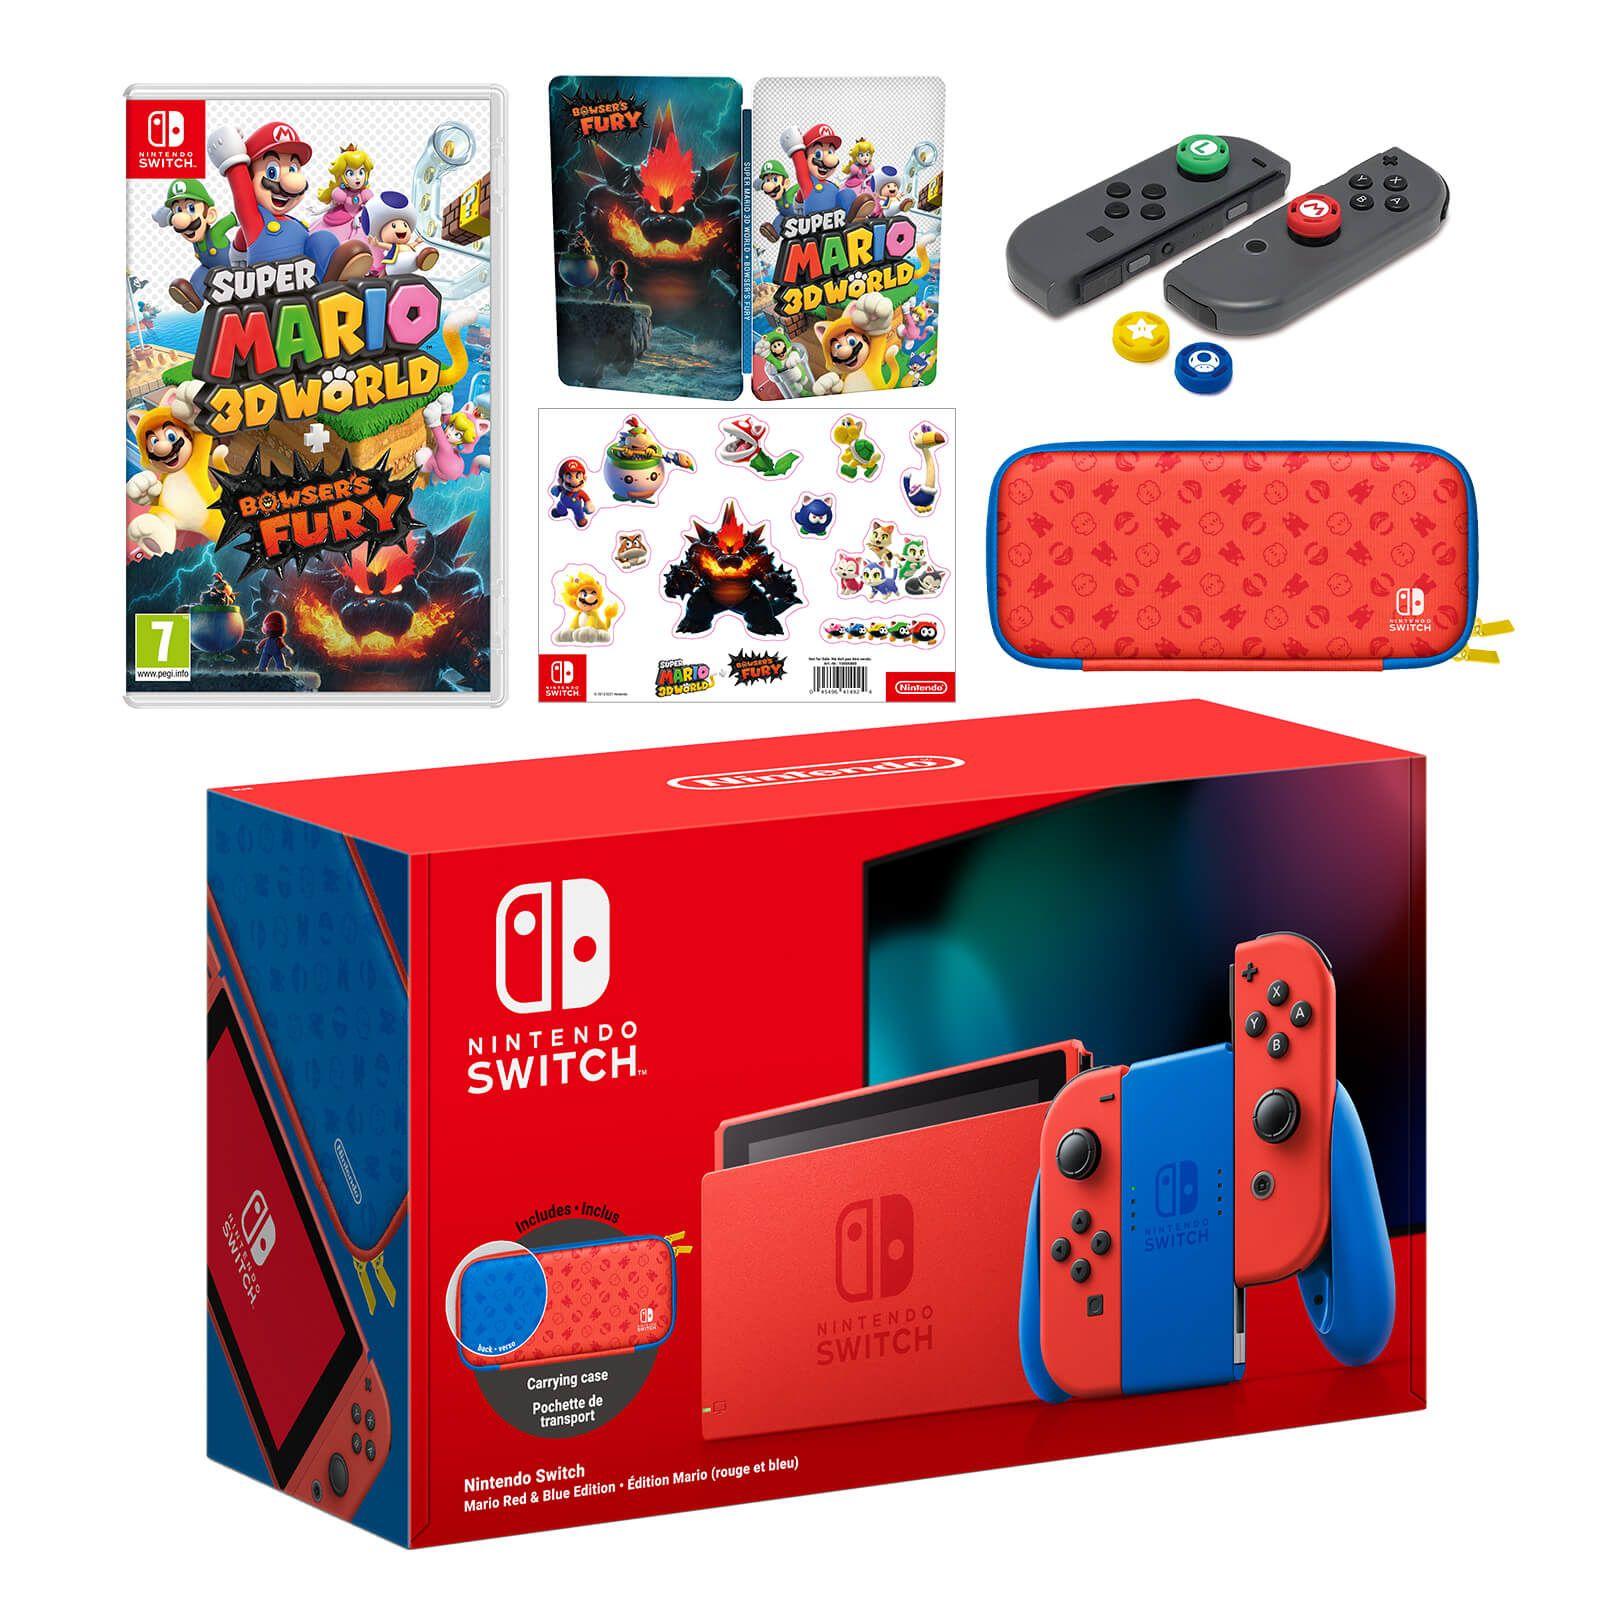 Nintendo Switch Mario Red & Blue Edition + Super Mario 3D World + Bowser's Fury Pack + Analog Stick Caps - £329.99 @ Nintendo Store